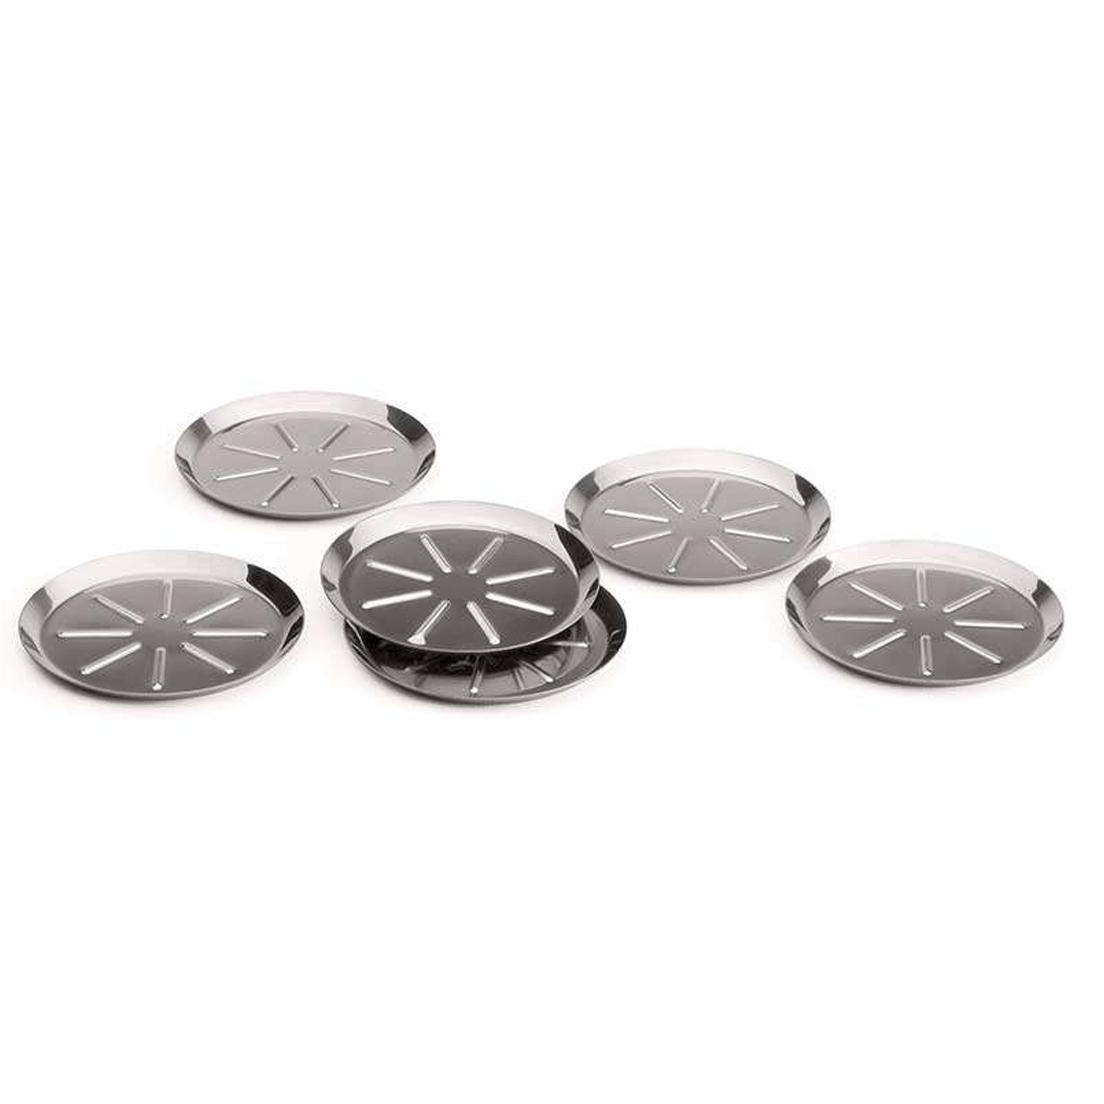 Conjunto de Porta Copos Forma de Aço Inox 6 Peças